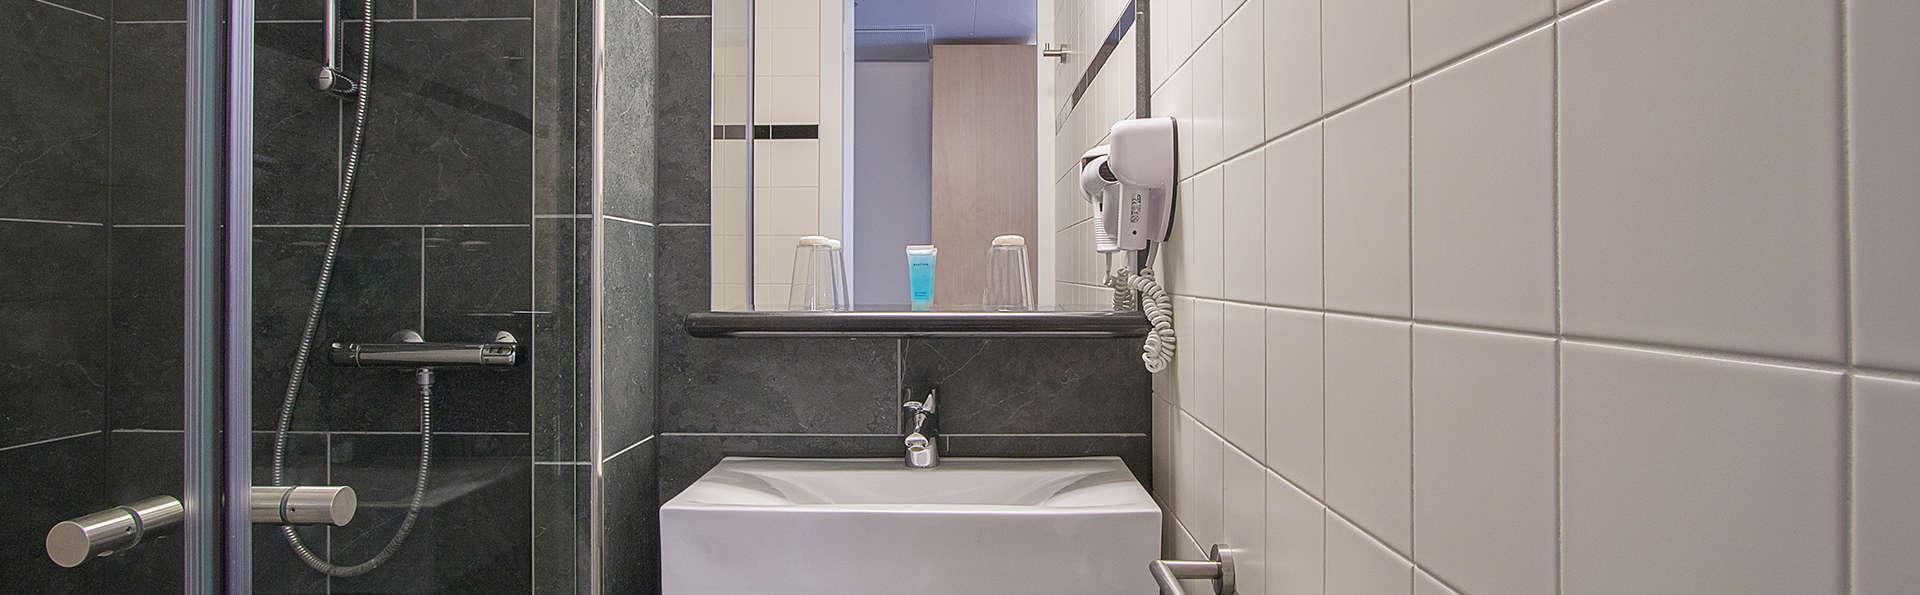 Bastion Hotel Schiphol Hoofddorp - edit_bathroom.jpg